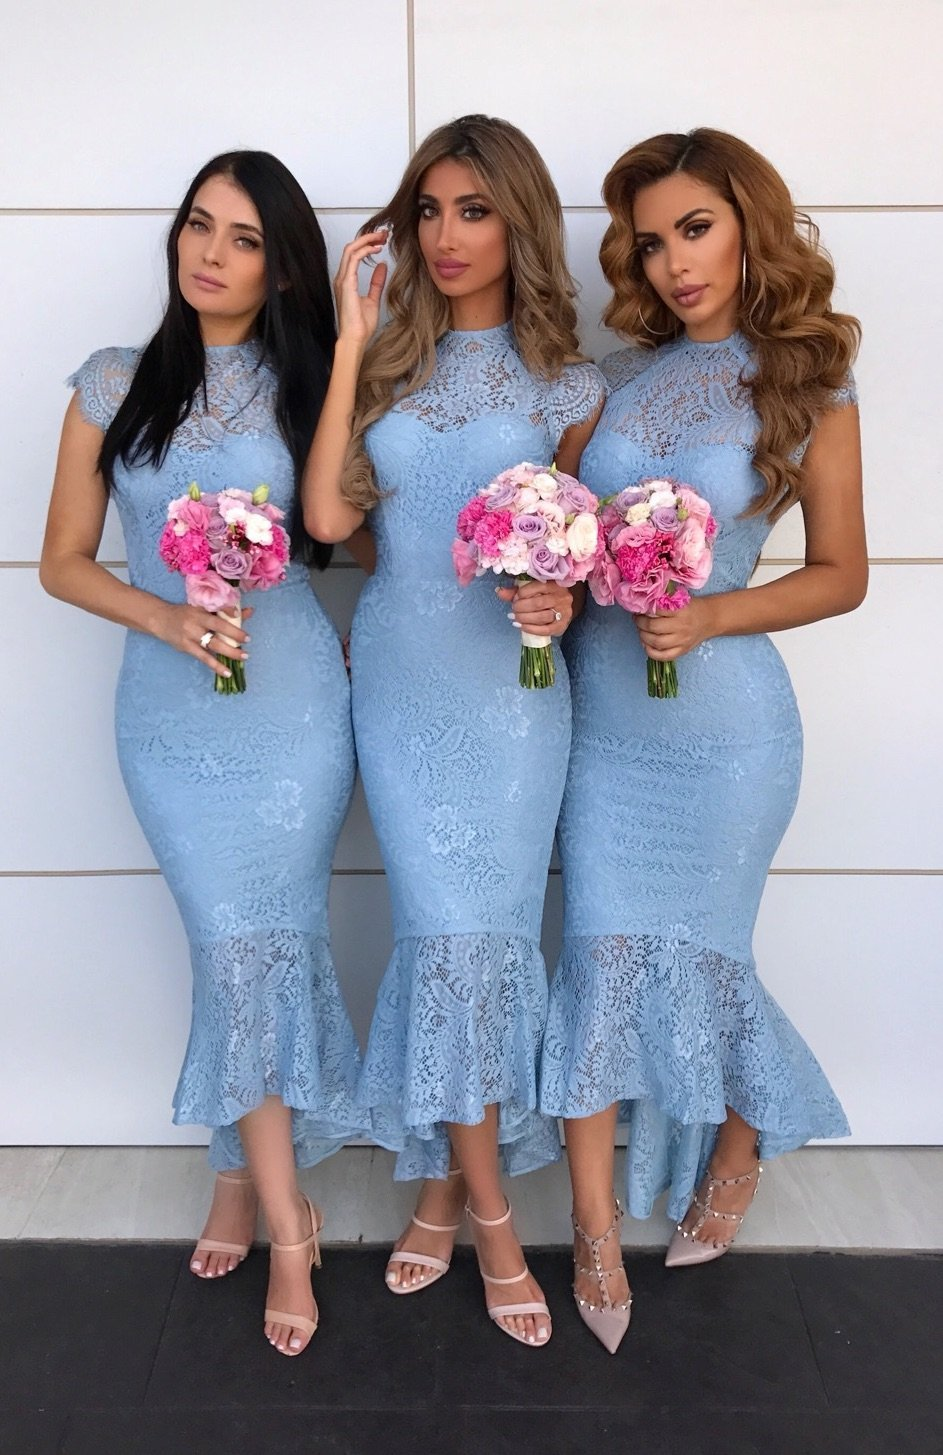 Vestido Para Festa 2020 Wedding Guest Dresses Elegant Ruffles Mermaid Bridesmaid Dress Blue Lace Bridesmaid Wedding Party Gowns